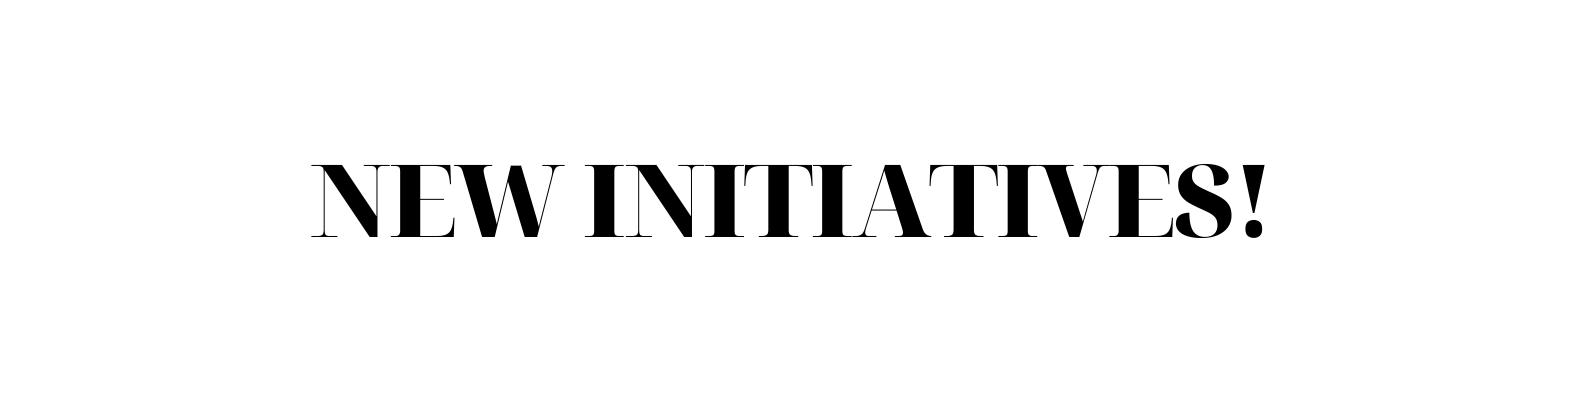 Investigative Selfism logo